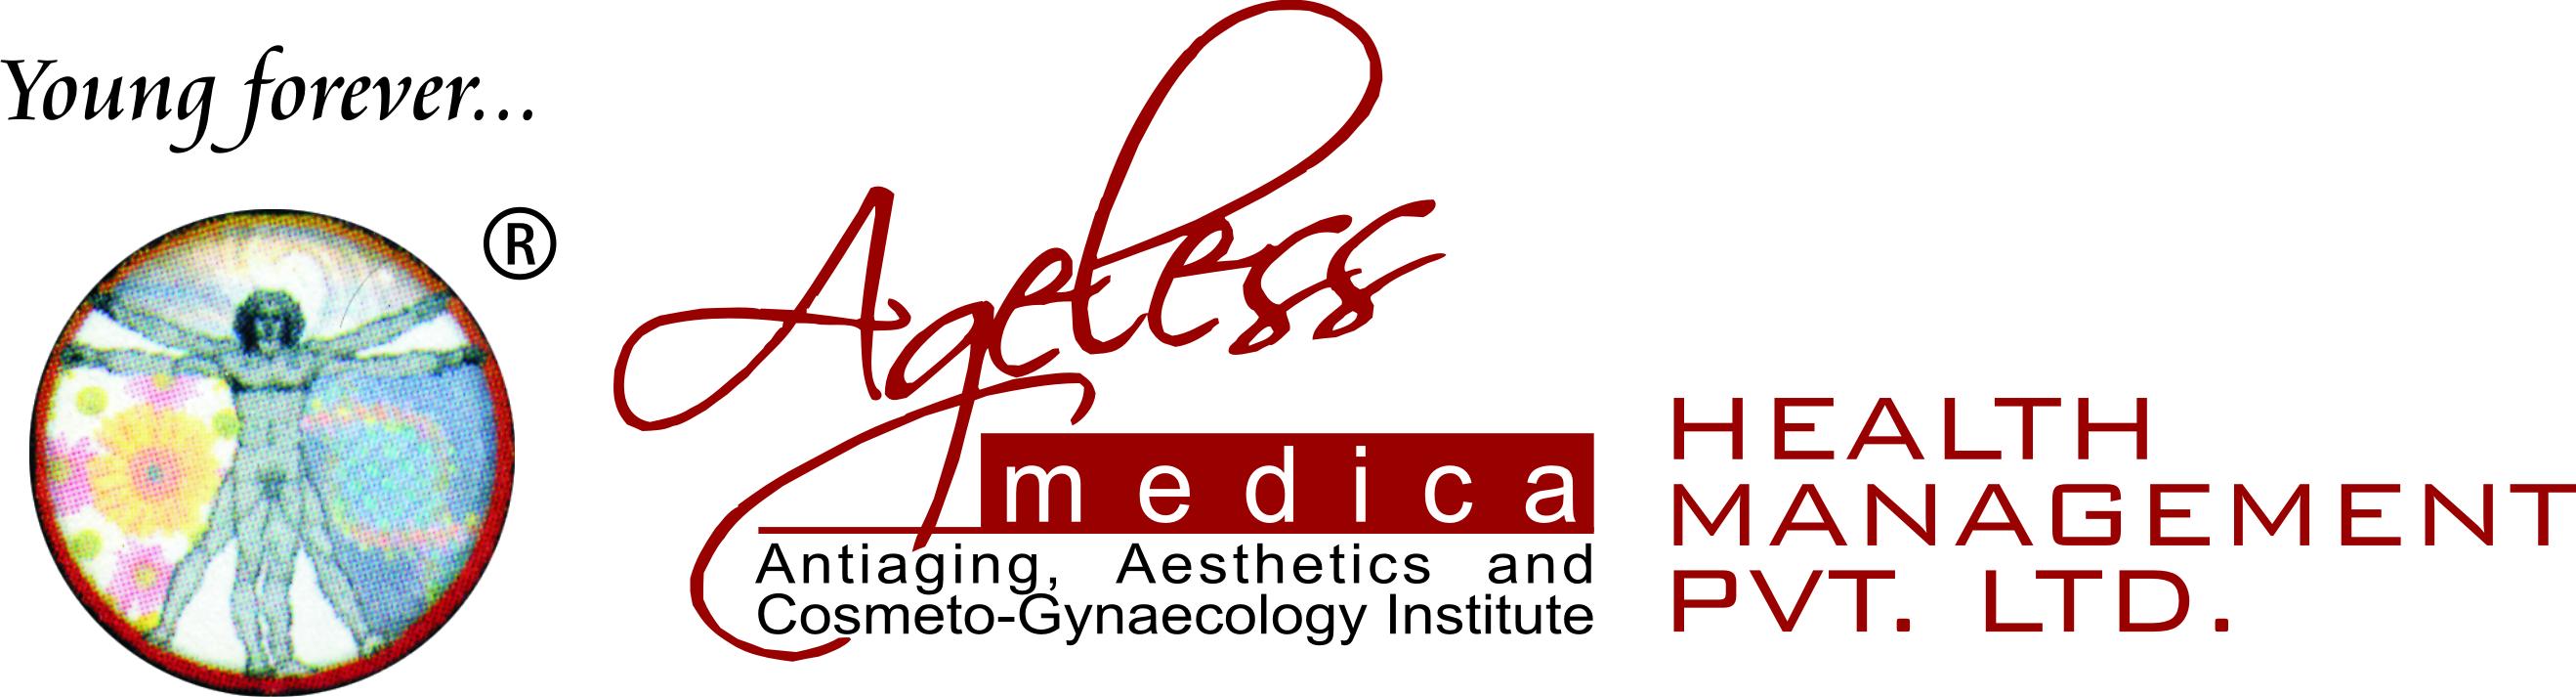 Ageless Medica Health Management Pvt. Ltd.